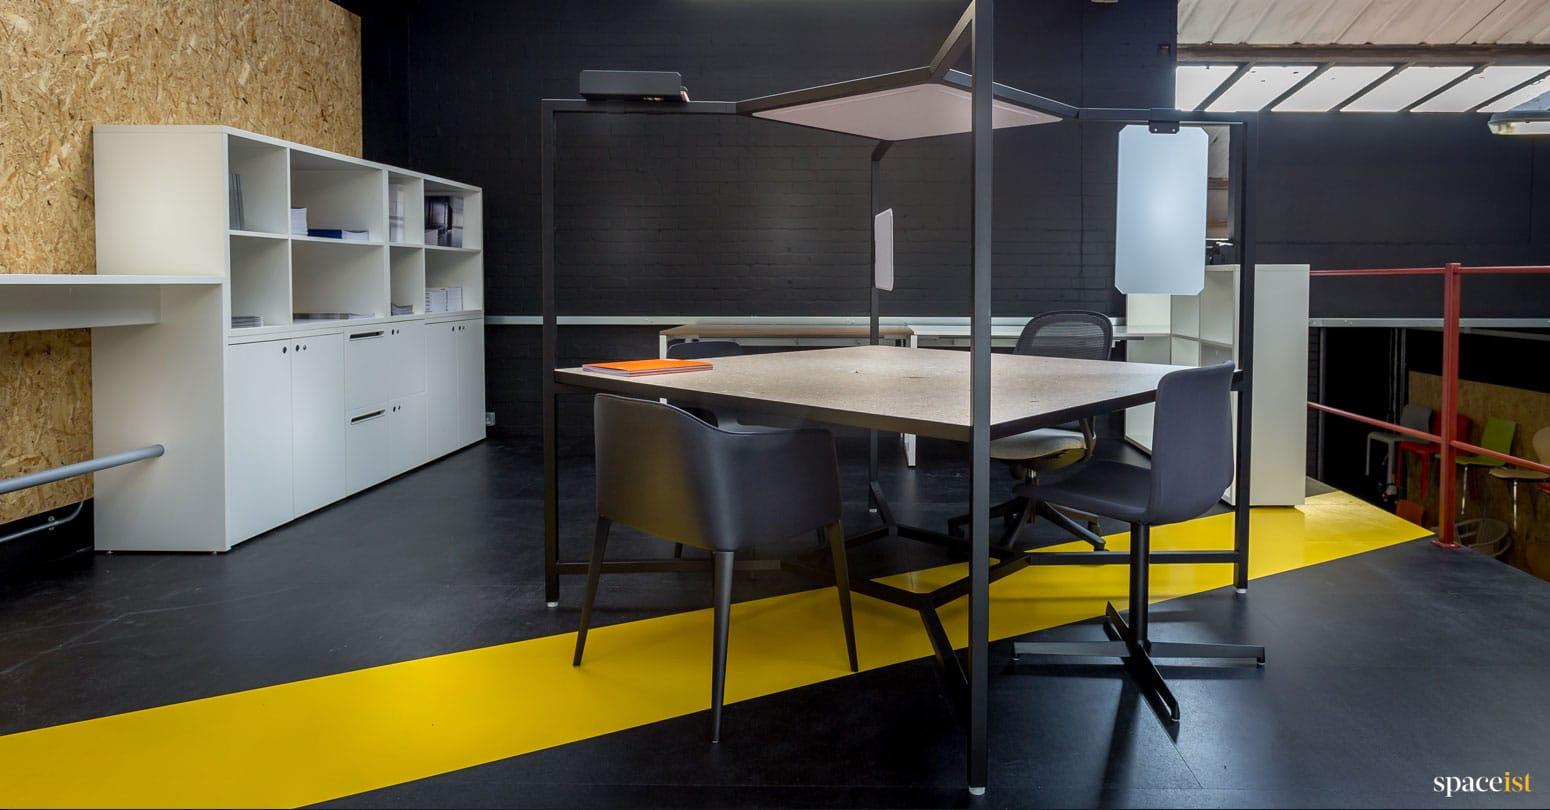 Spaceist furniture showroom black Hub desk